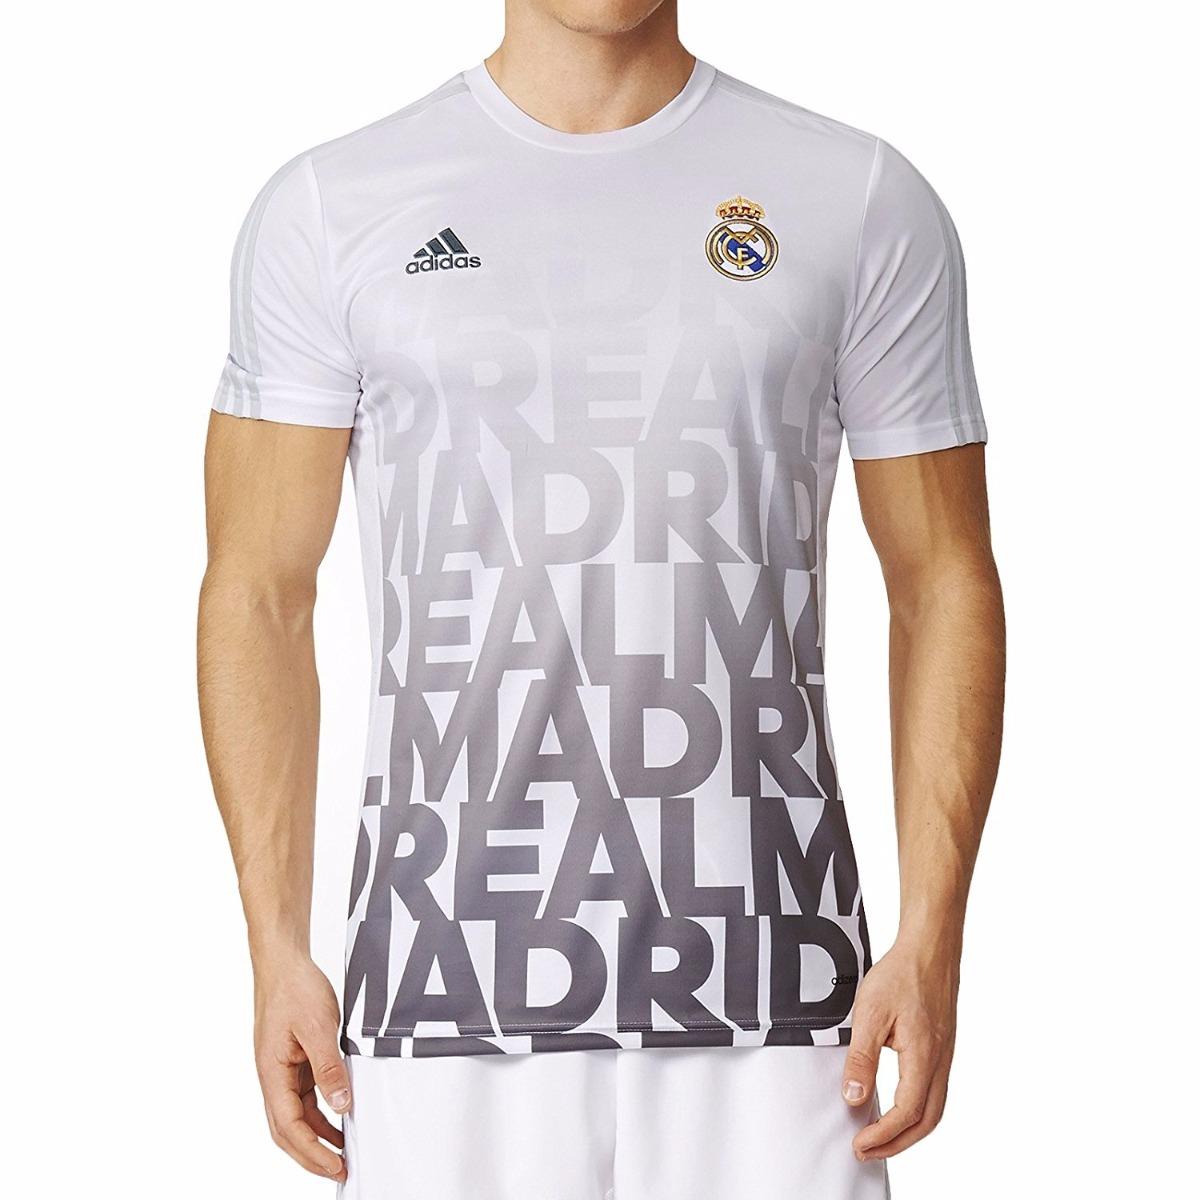 11b2c68d4e258 camiseta polo futbol club real madrid adidas nike. Cargando zoom.